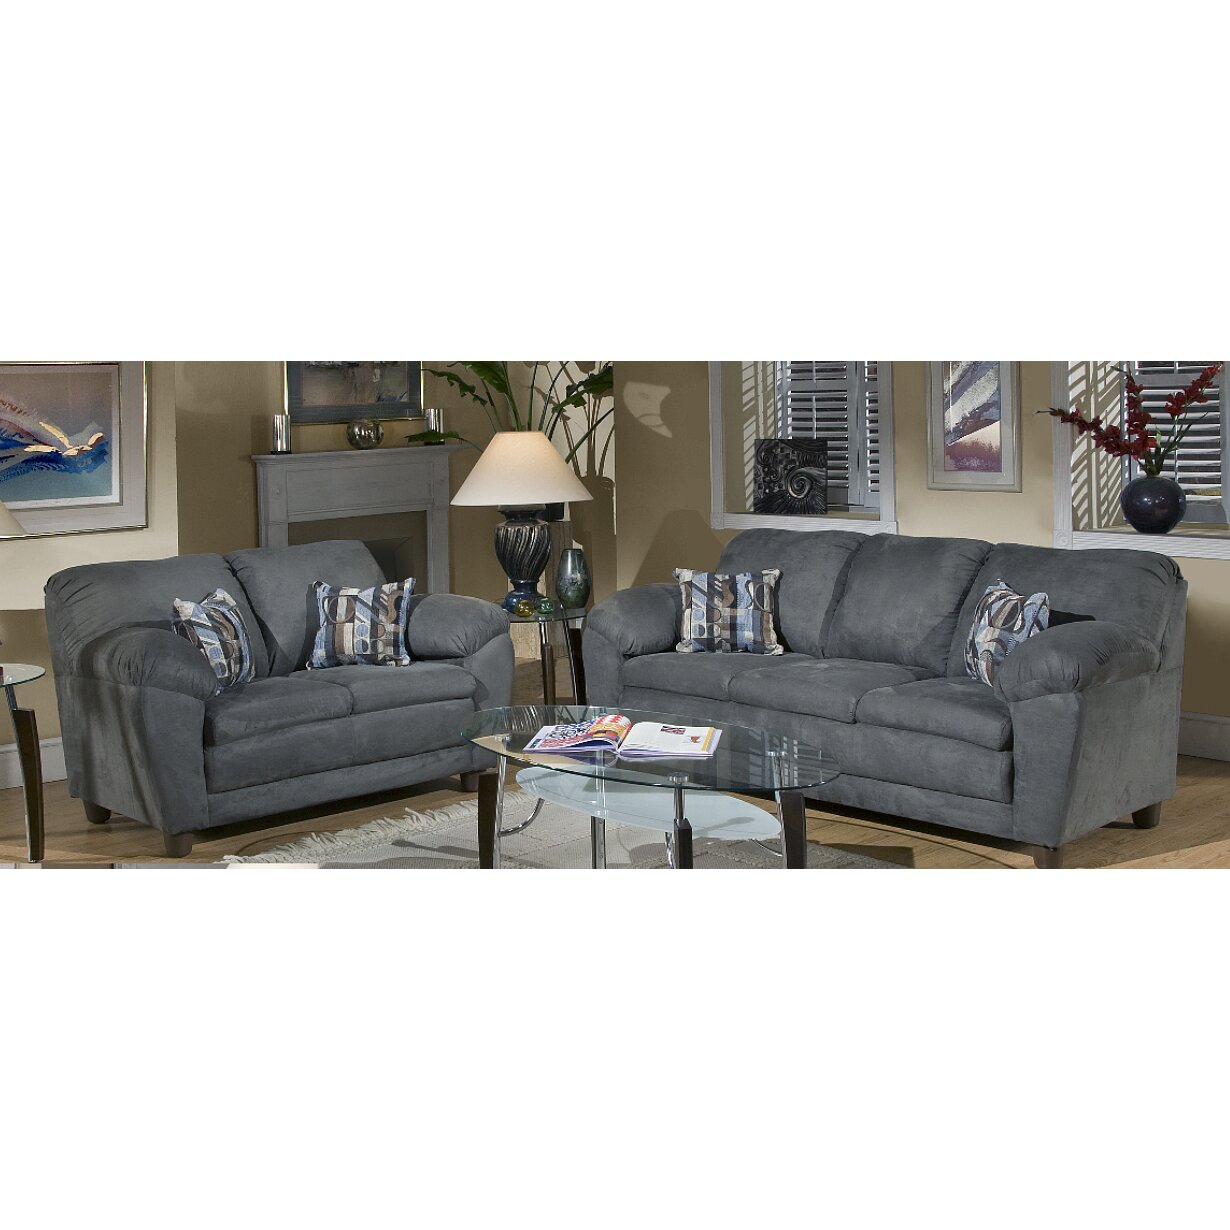 Red Barrel Studio Redhook Living Room Collection Reviews Wayfair